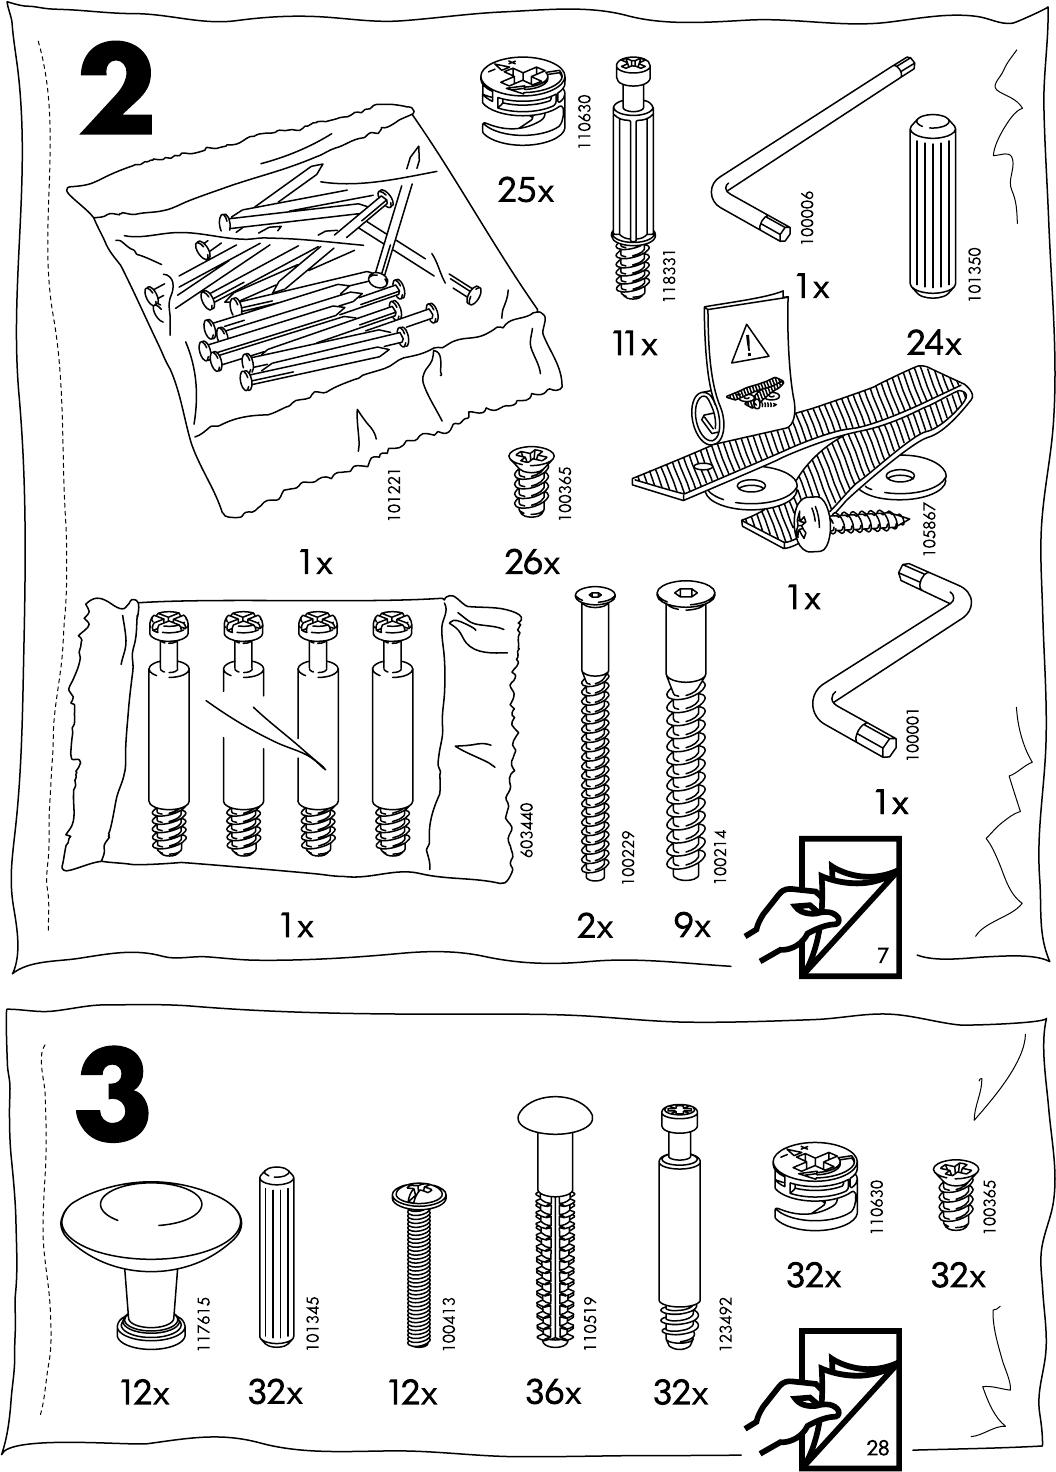 Ladekast 8 Lades.Handleiding Ikea Hemnes Ladekast 8 Lades Pagina 4 Van 32 Dansk